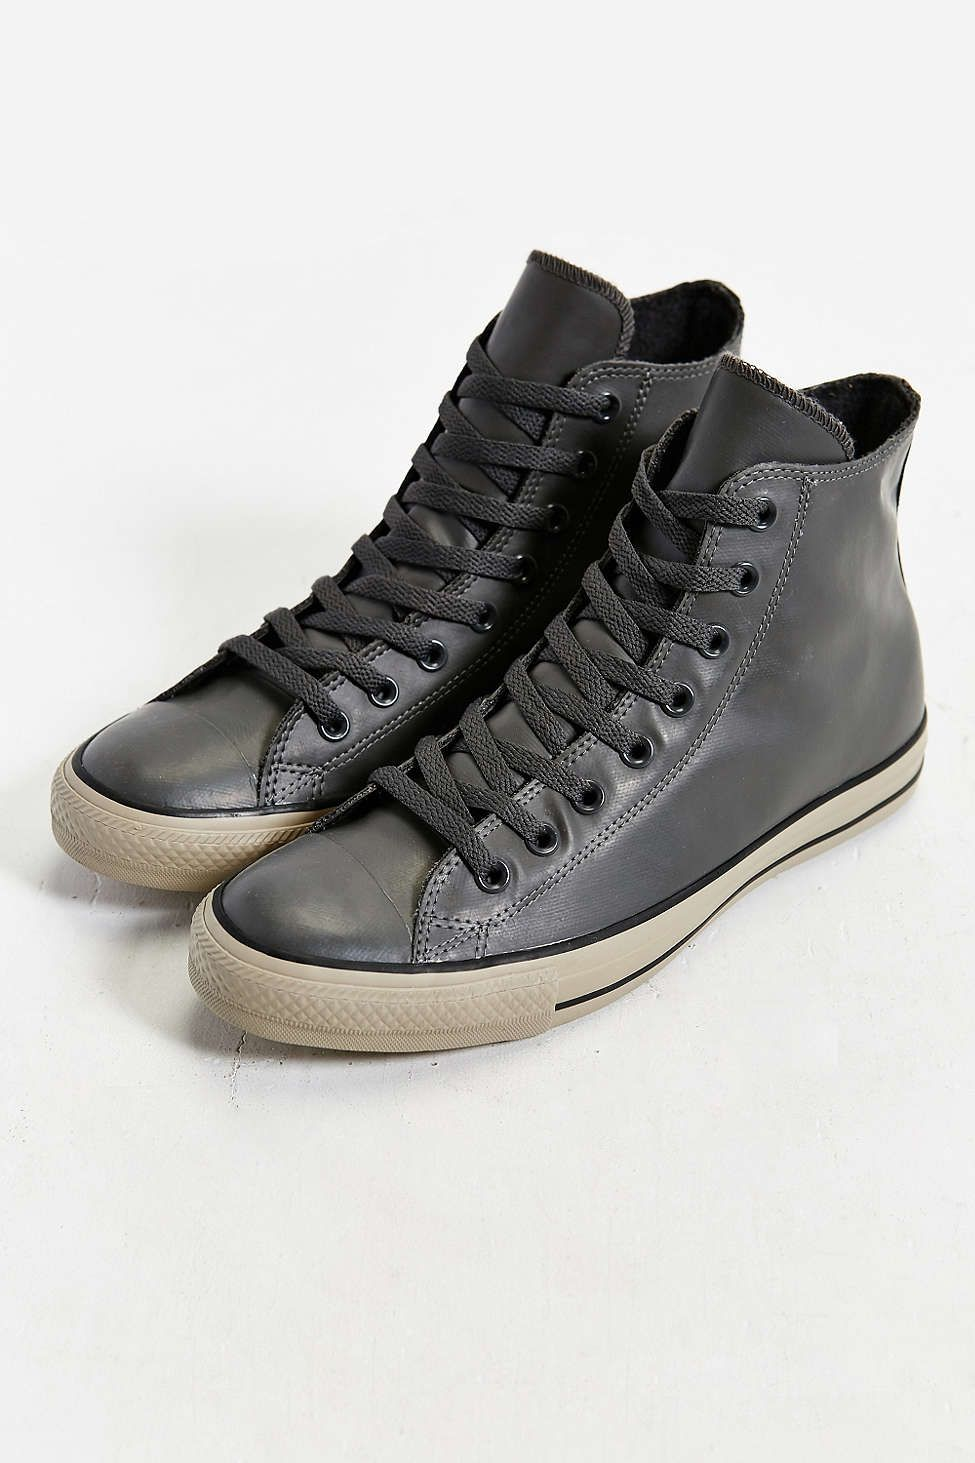 9c25c47b19607e Converse Chuck Taylor All Star Rubber High-Top Sneakerboot ...